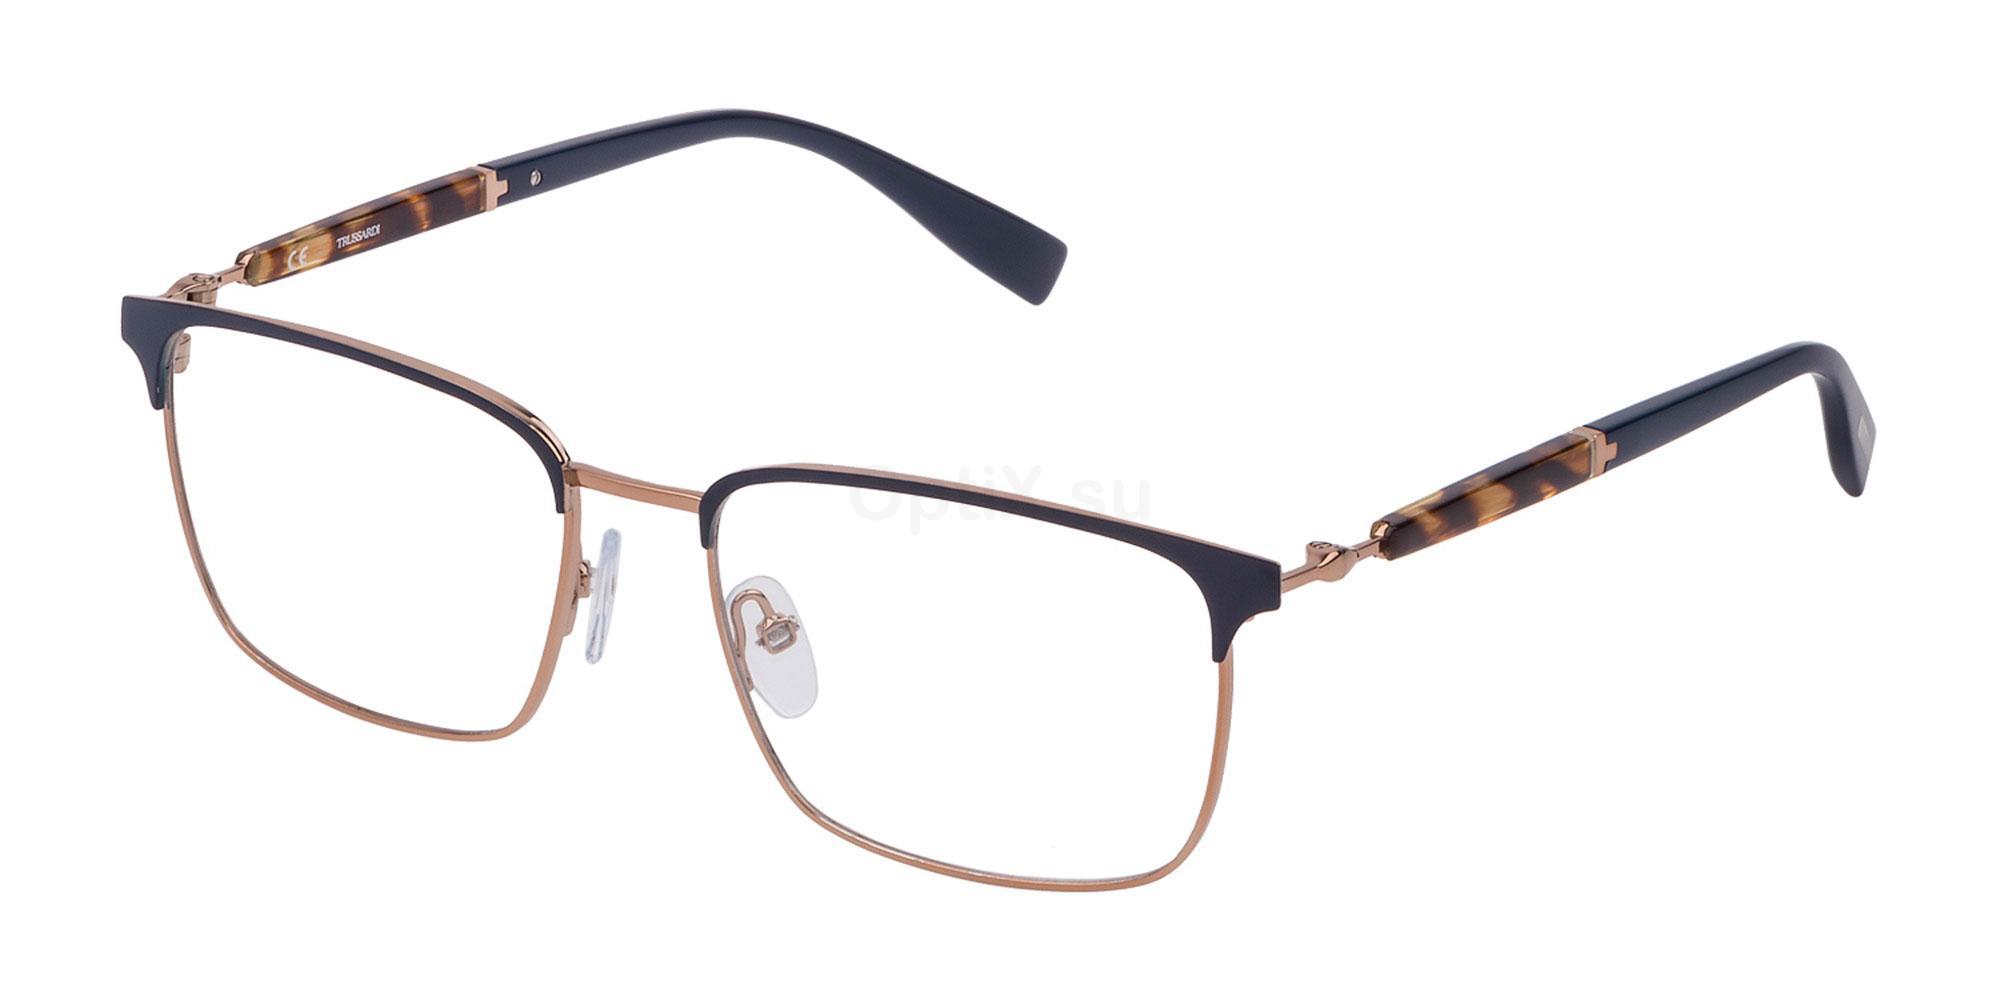 02A8 VTR353 Glasses, Trussardi